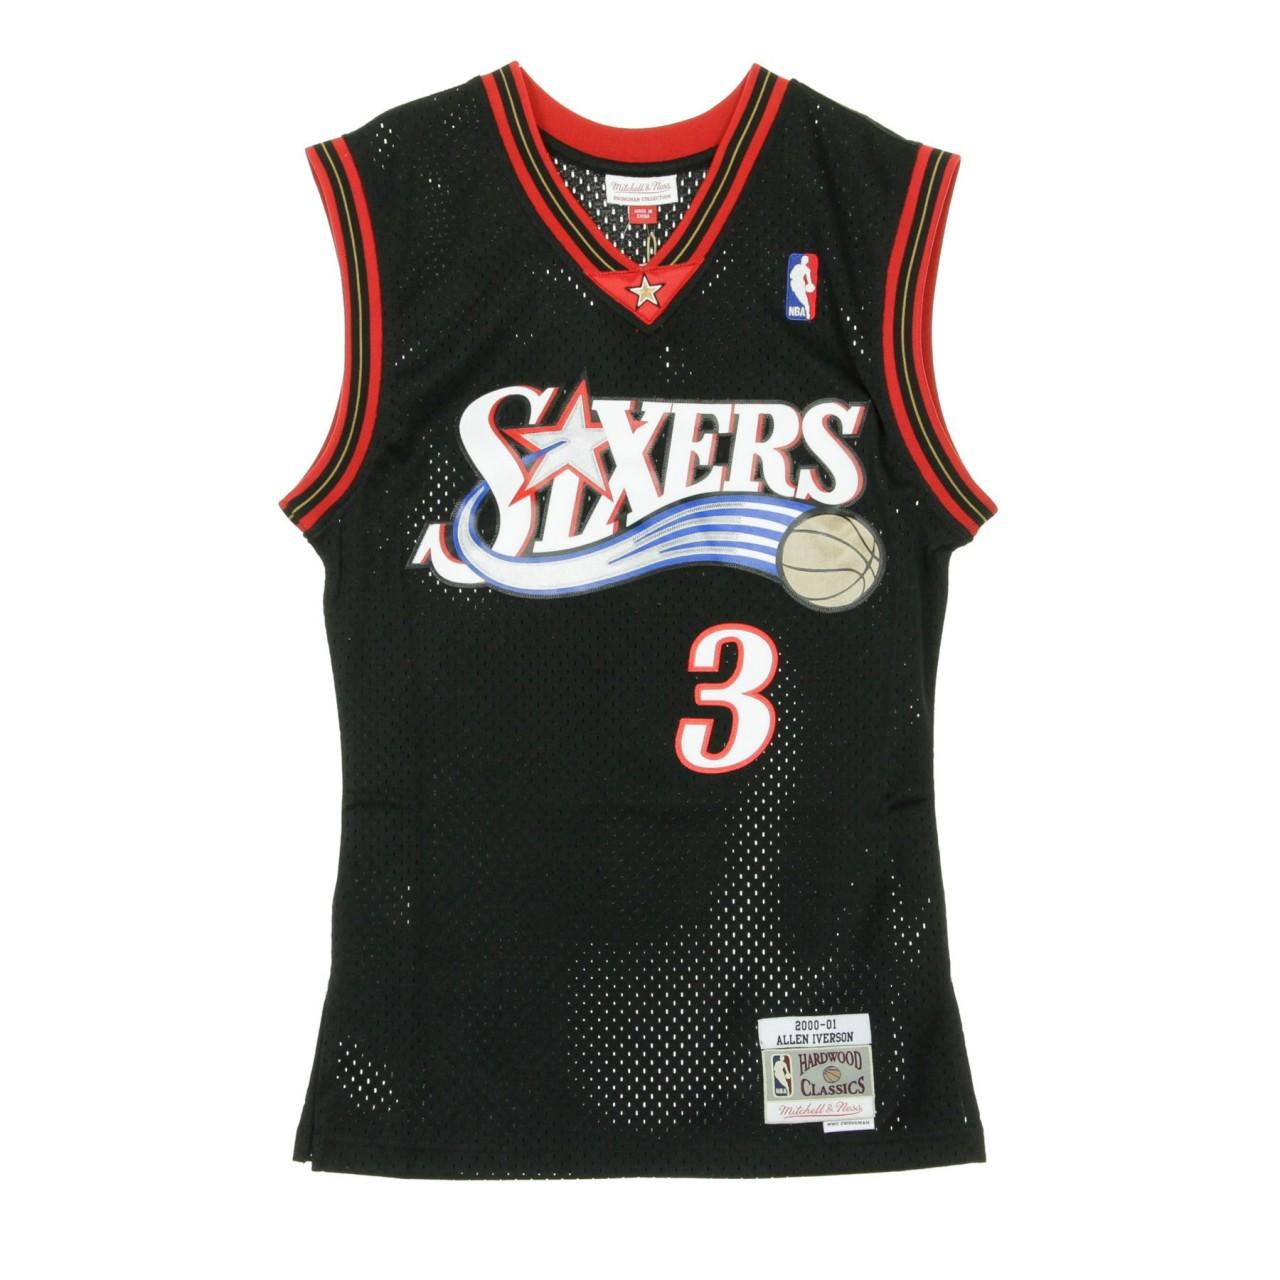 MITCHELL & NESS NBA SWINGMAN JERSEY ALLEN IVERSON NO.3 2000-01 PHI76E ROAD MN-NBA-353J-3B2-FGYAIV-PHIL76